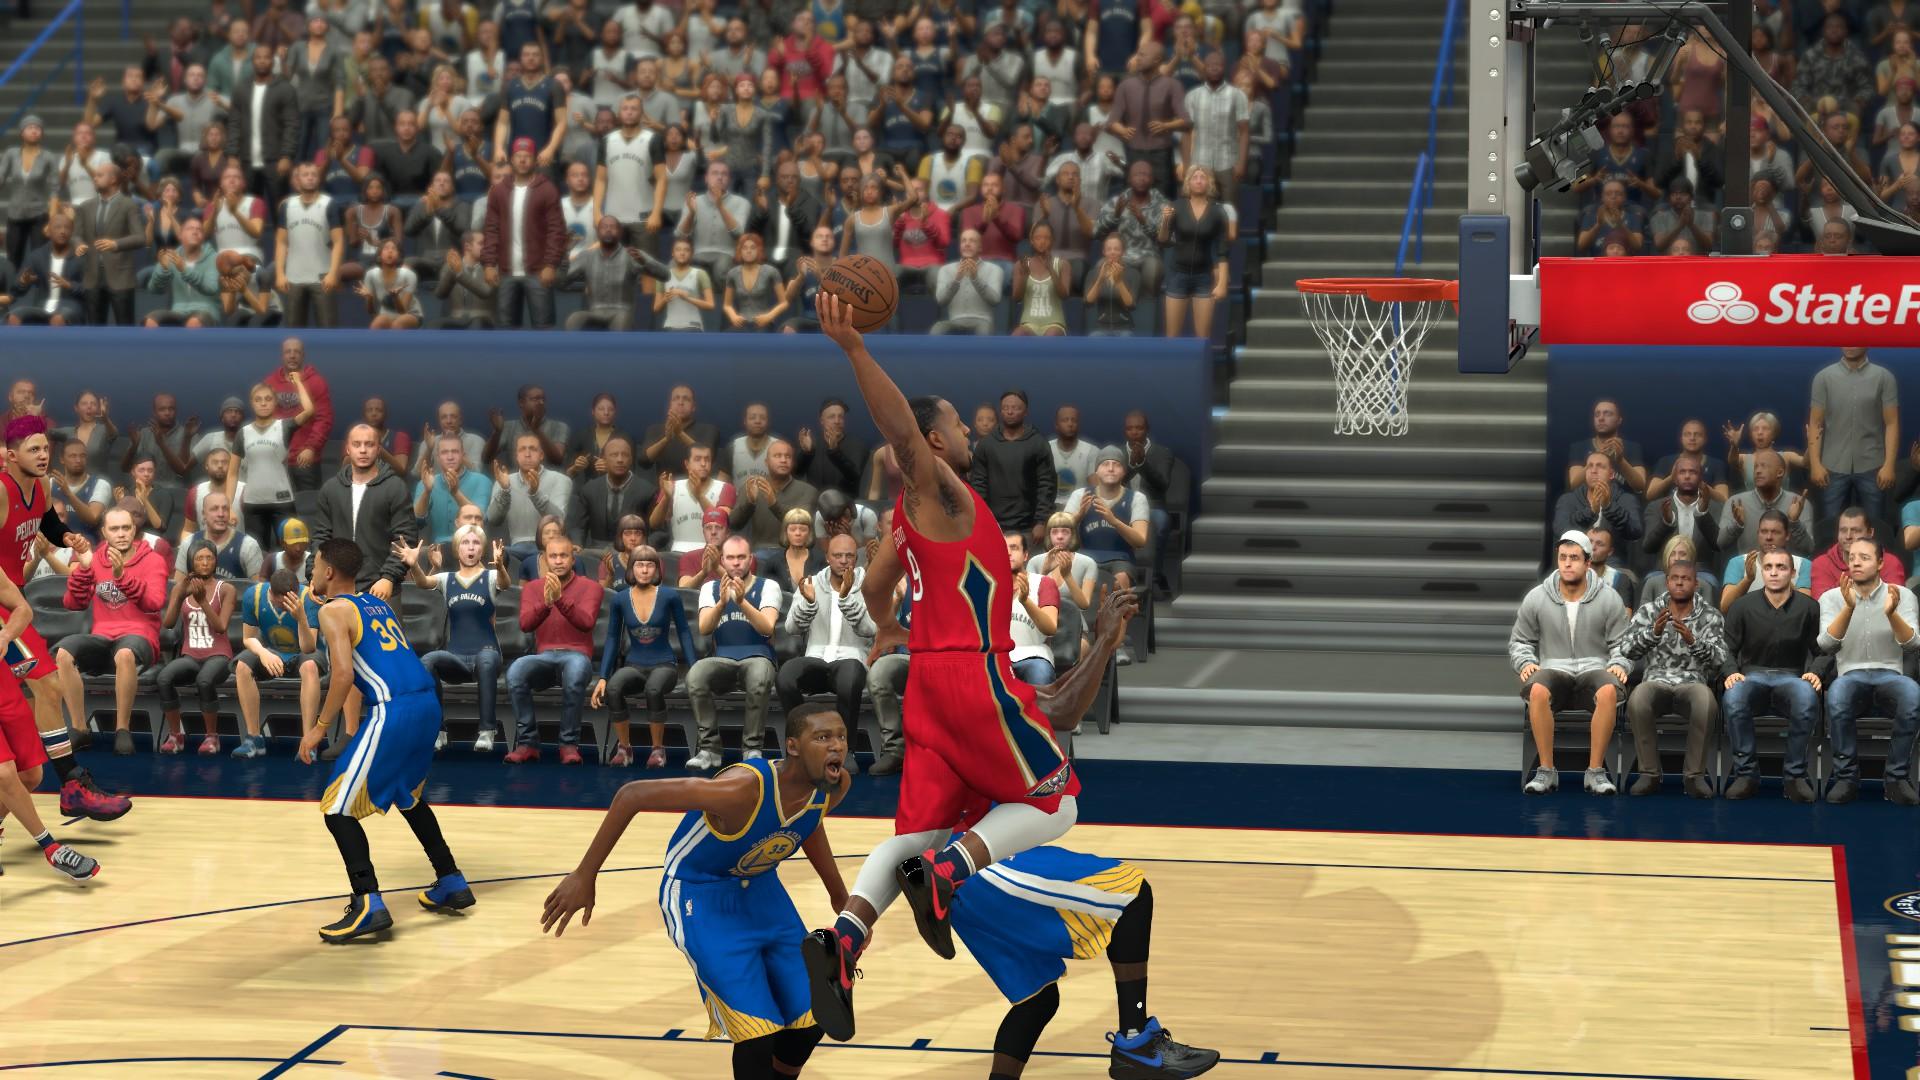 《NBA 2K17》NBA球迷的狂欢节2